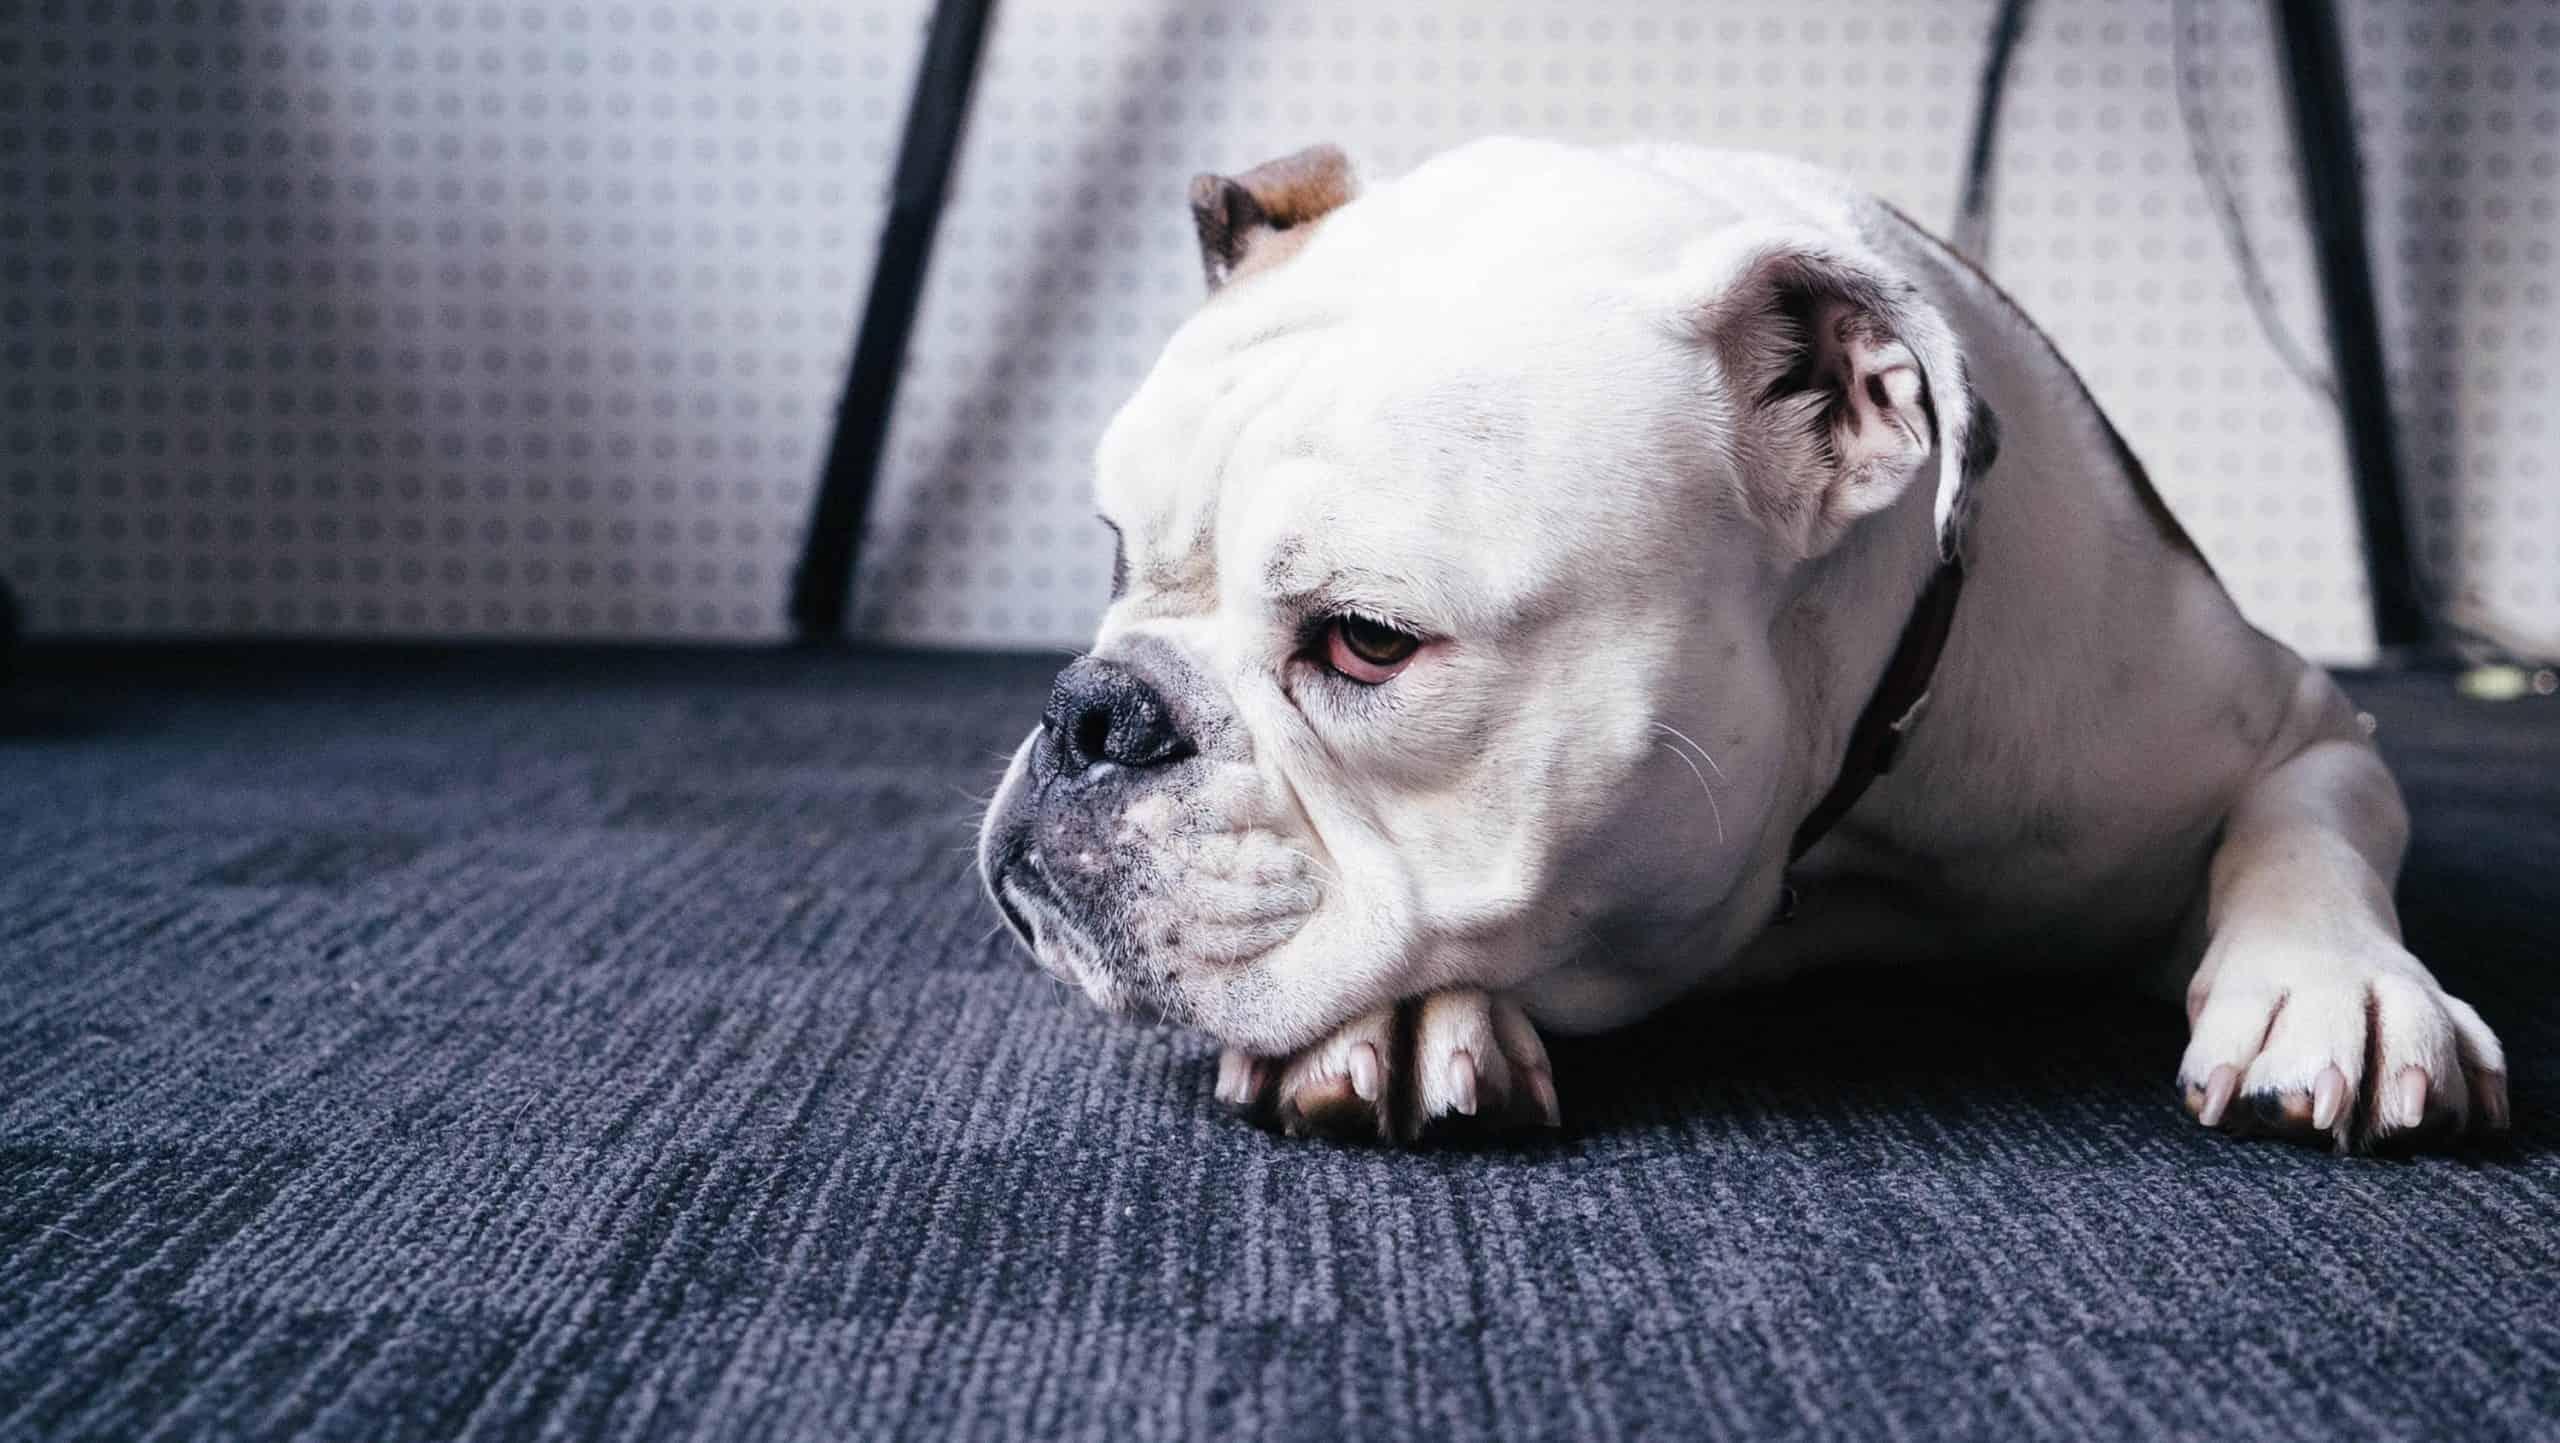 Dog © Unsplash